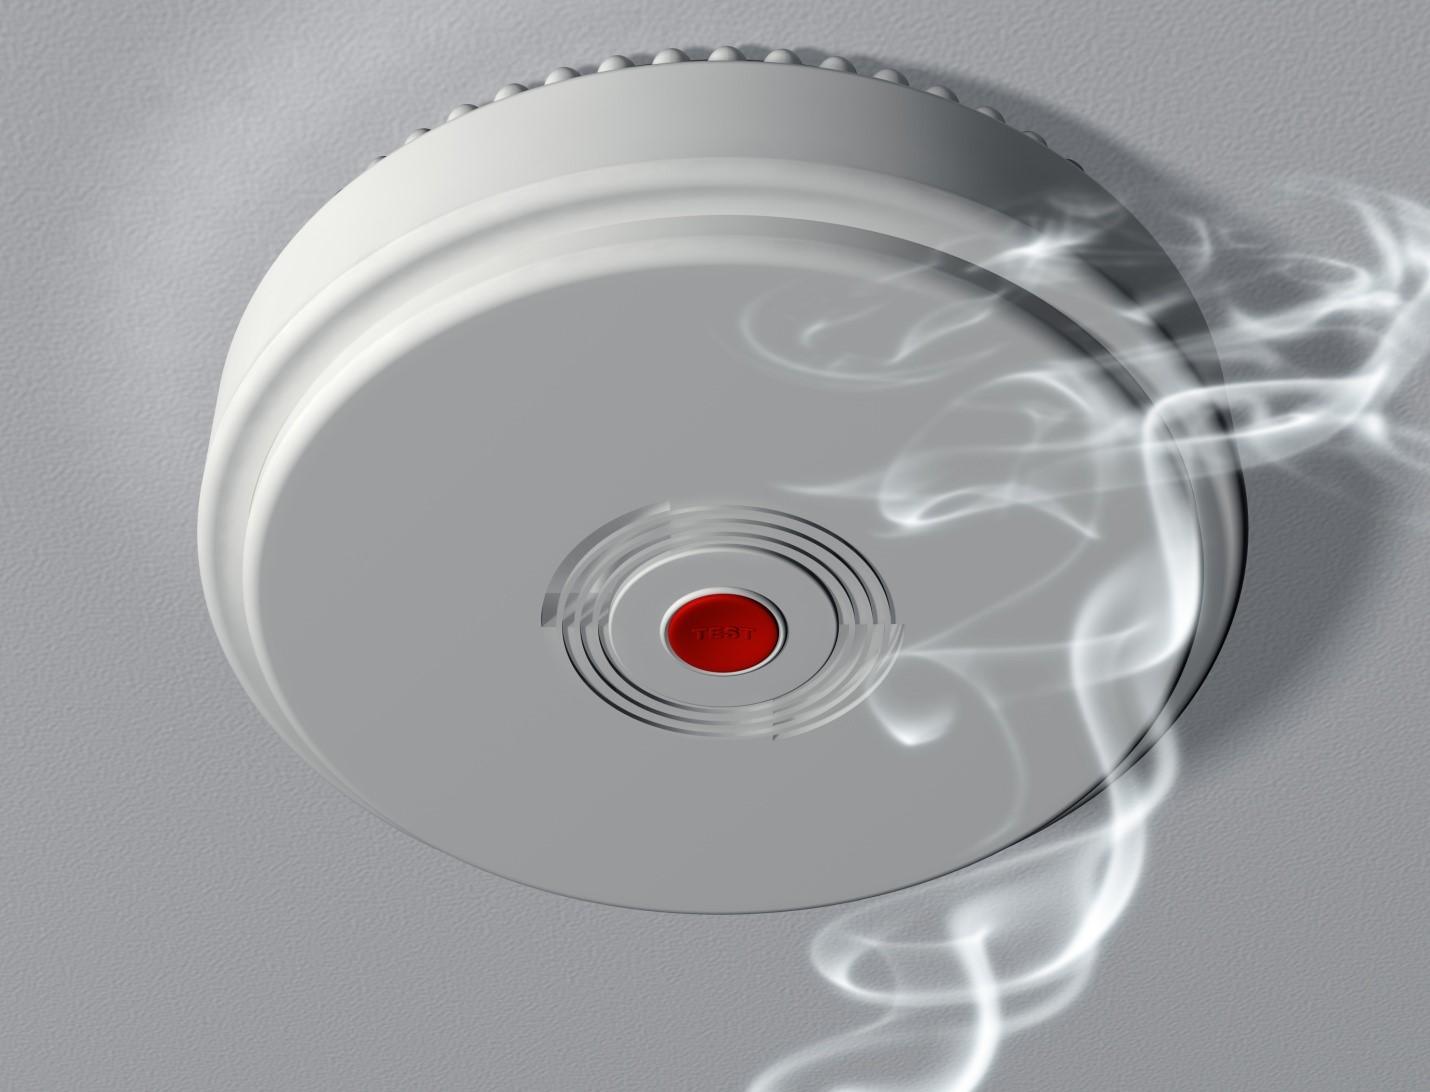 Smoke under smoke alarm